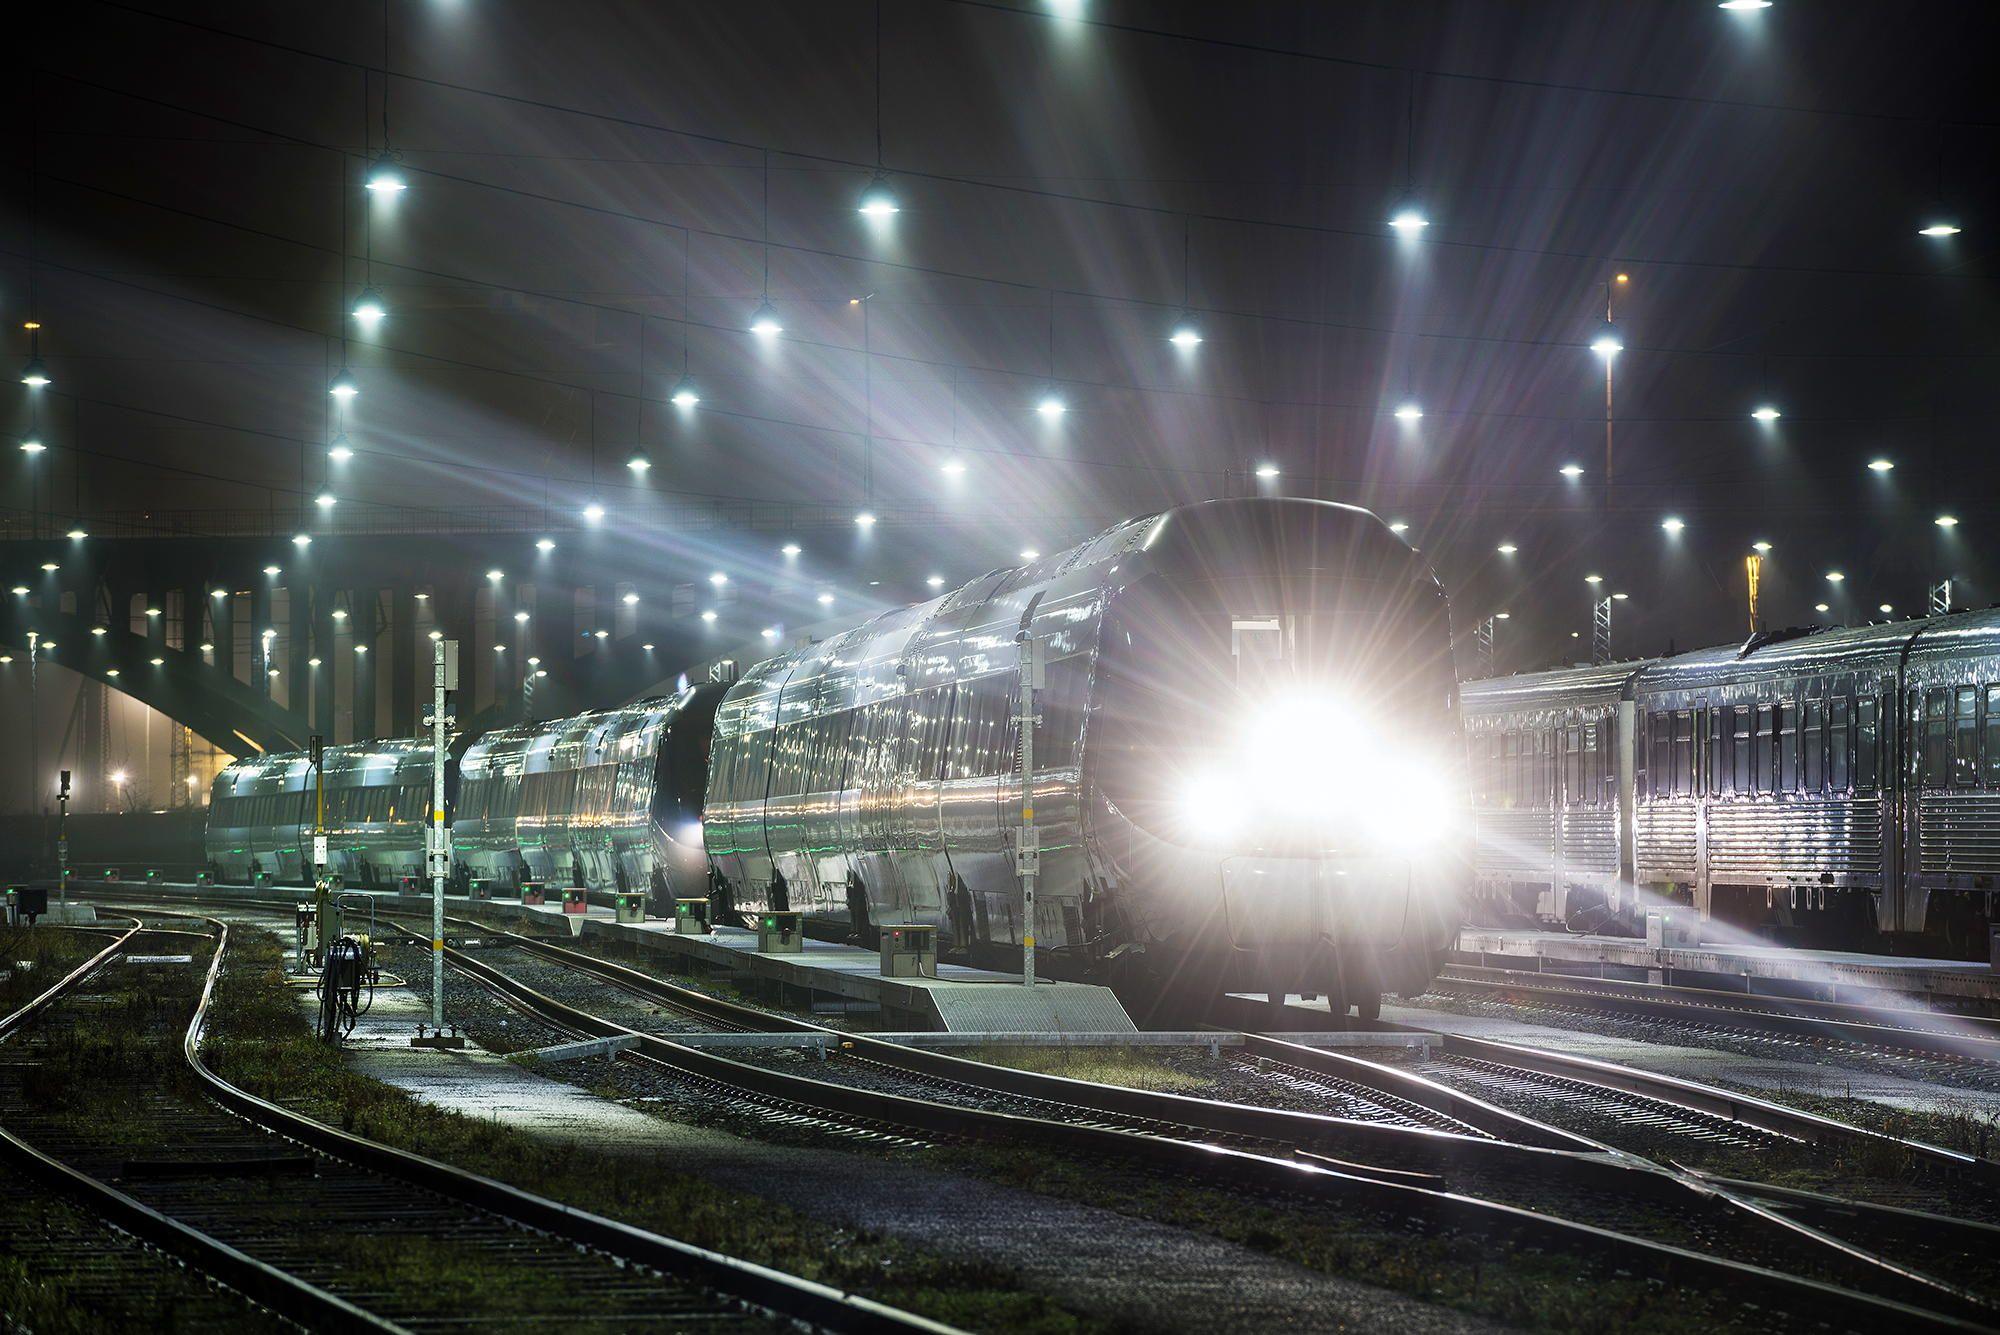 railway lights | Industrial | Pinterest